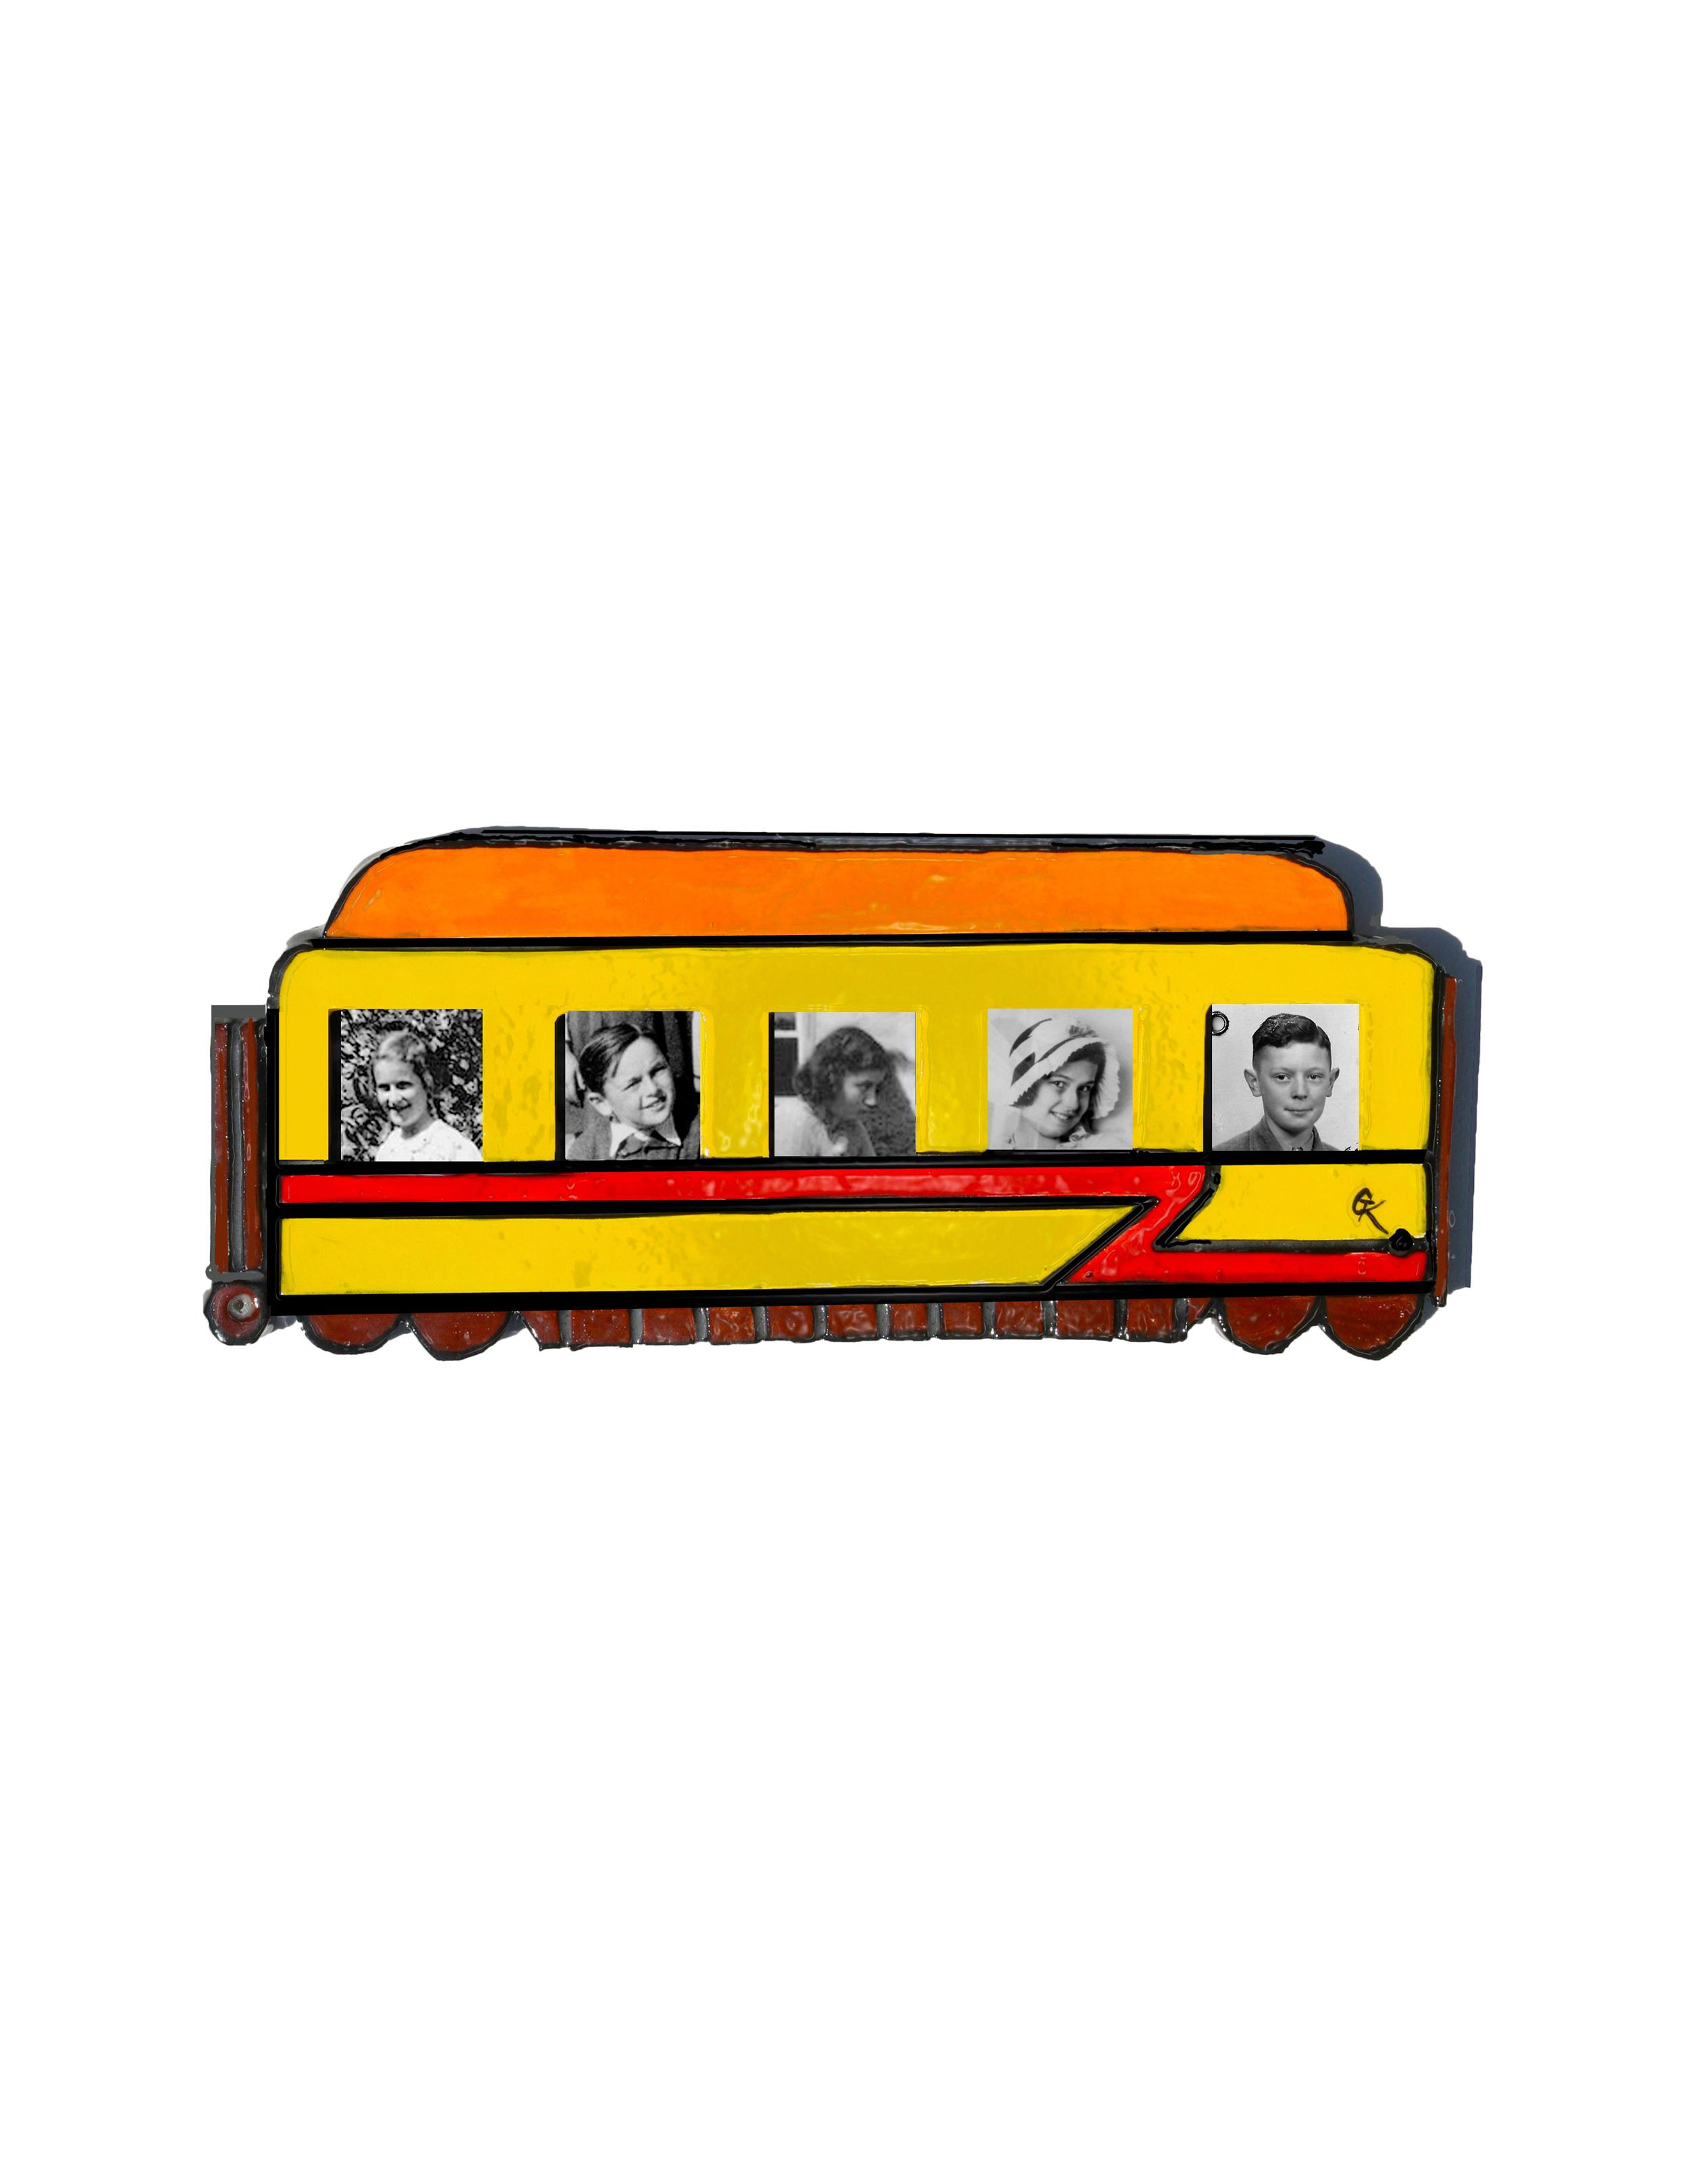 Train 49.jpg